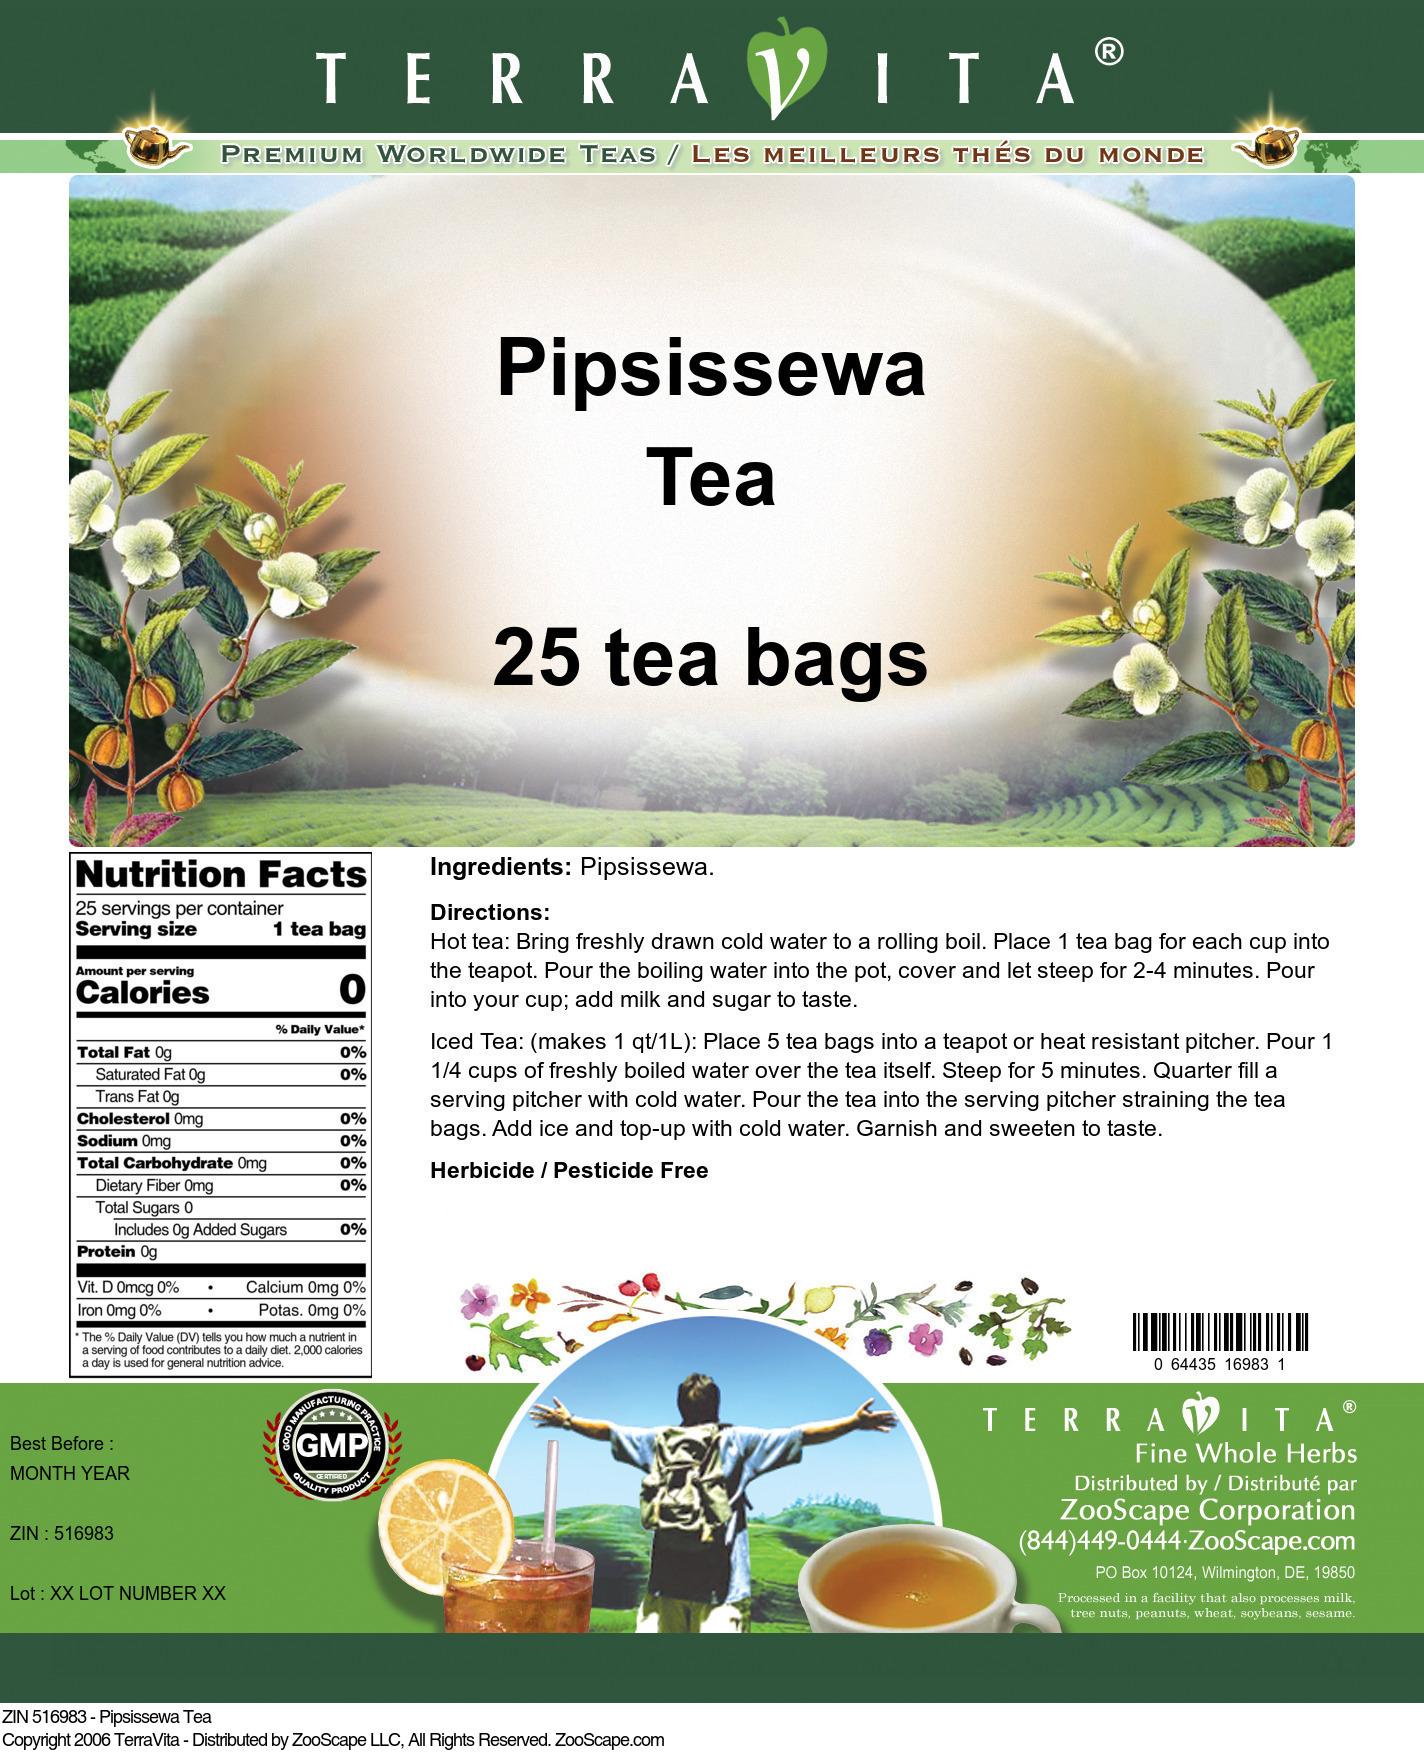 Pipsissewa Tea